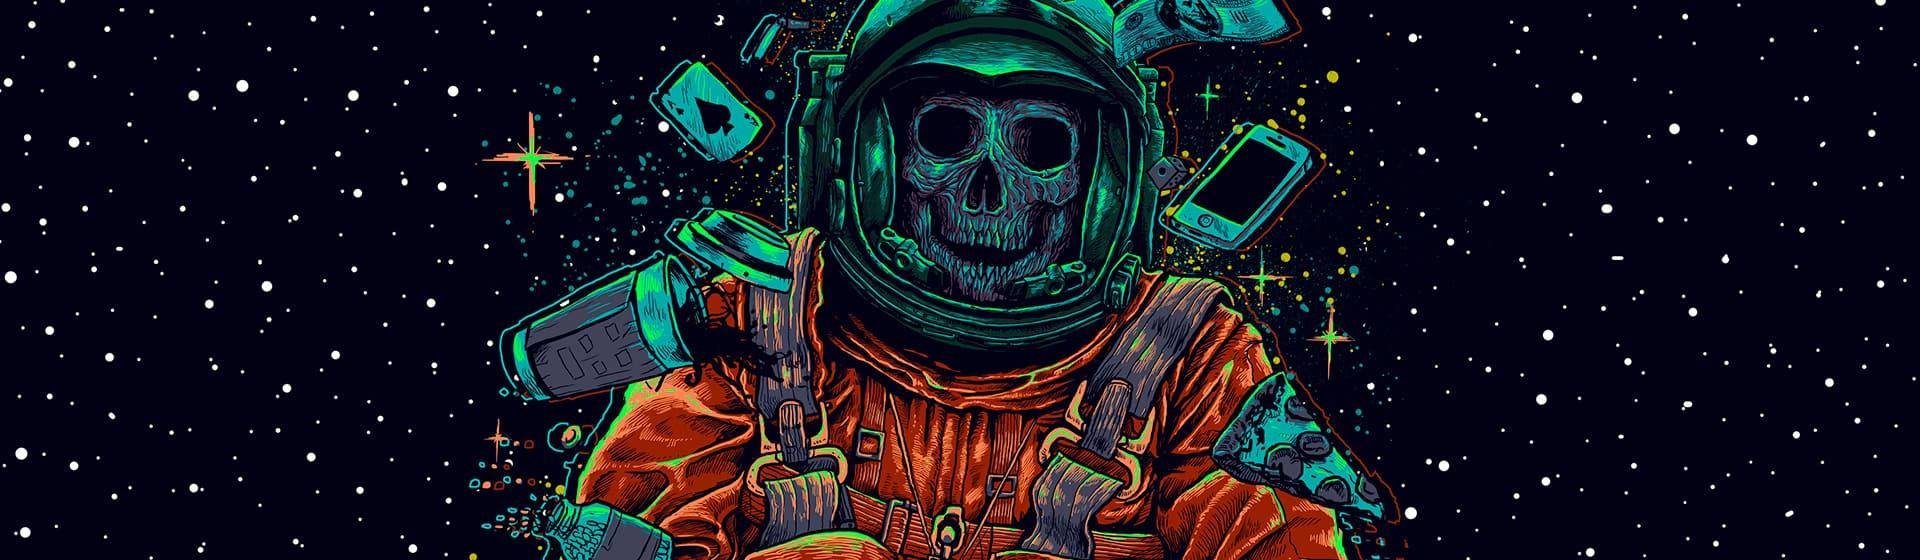 Космос - Шапки